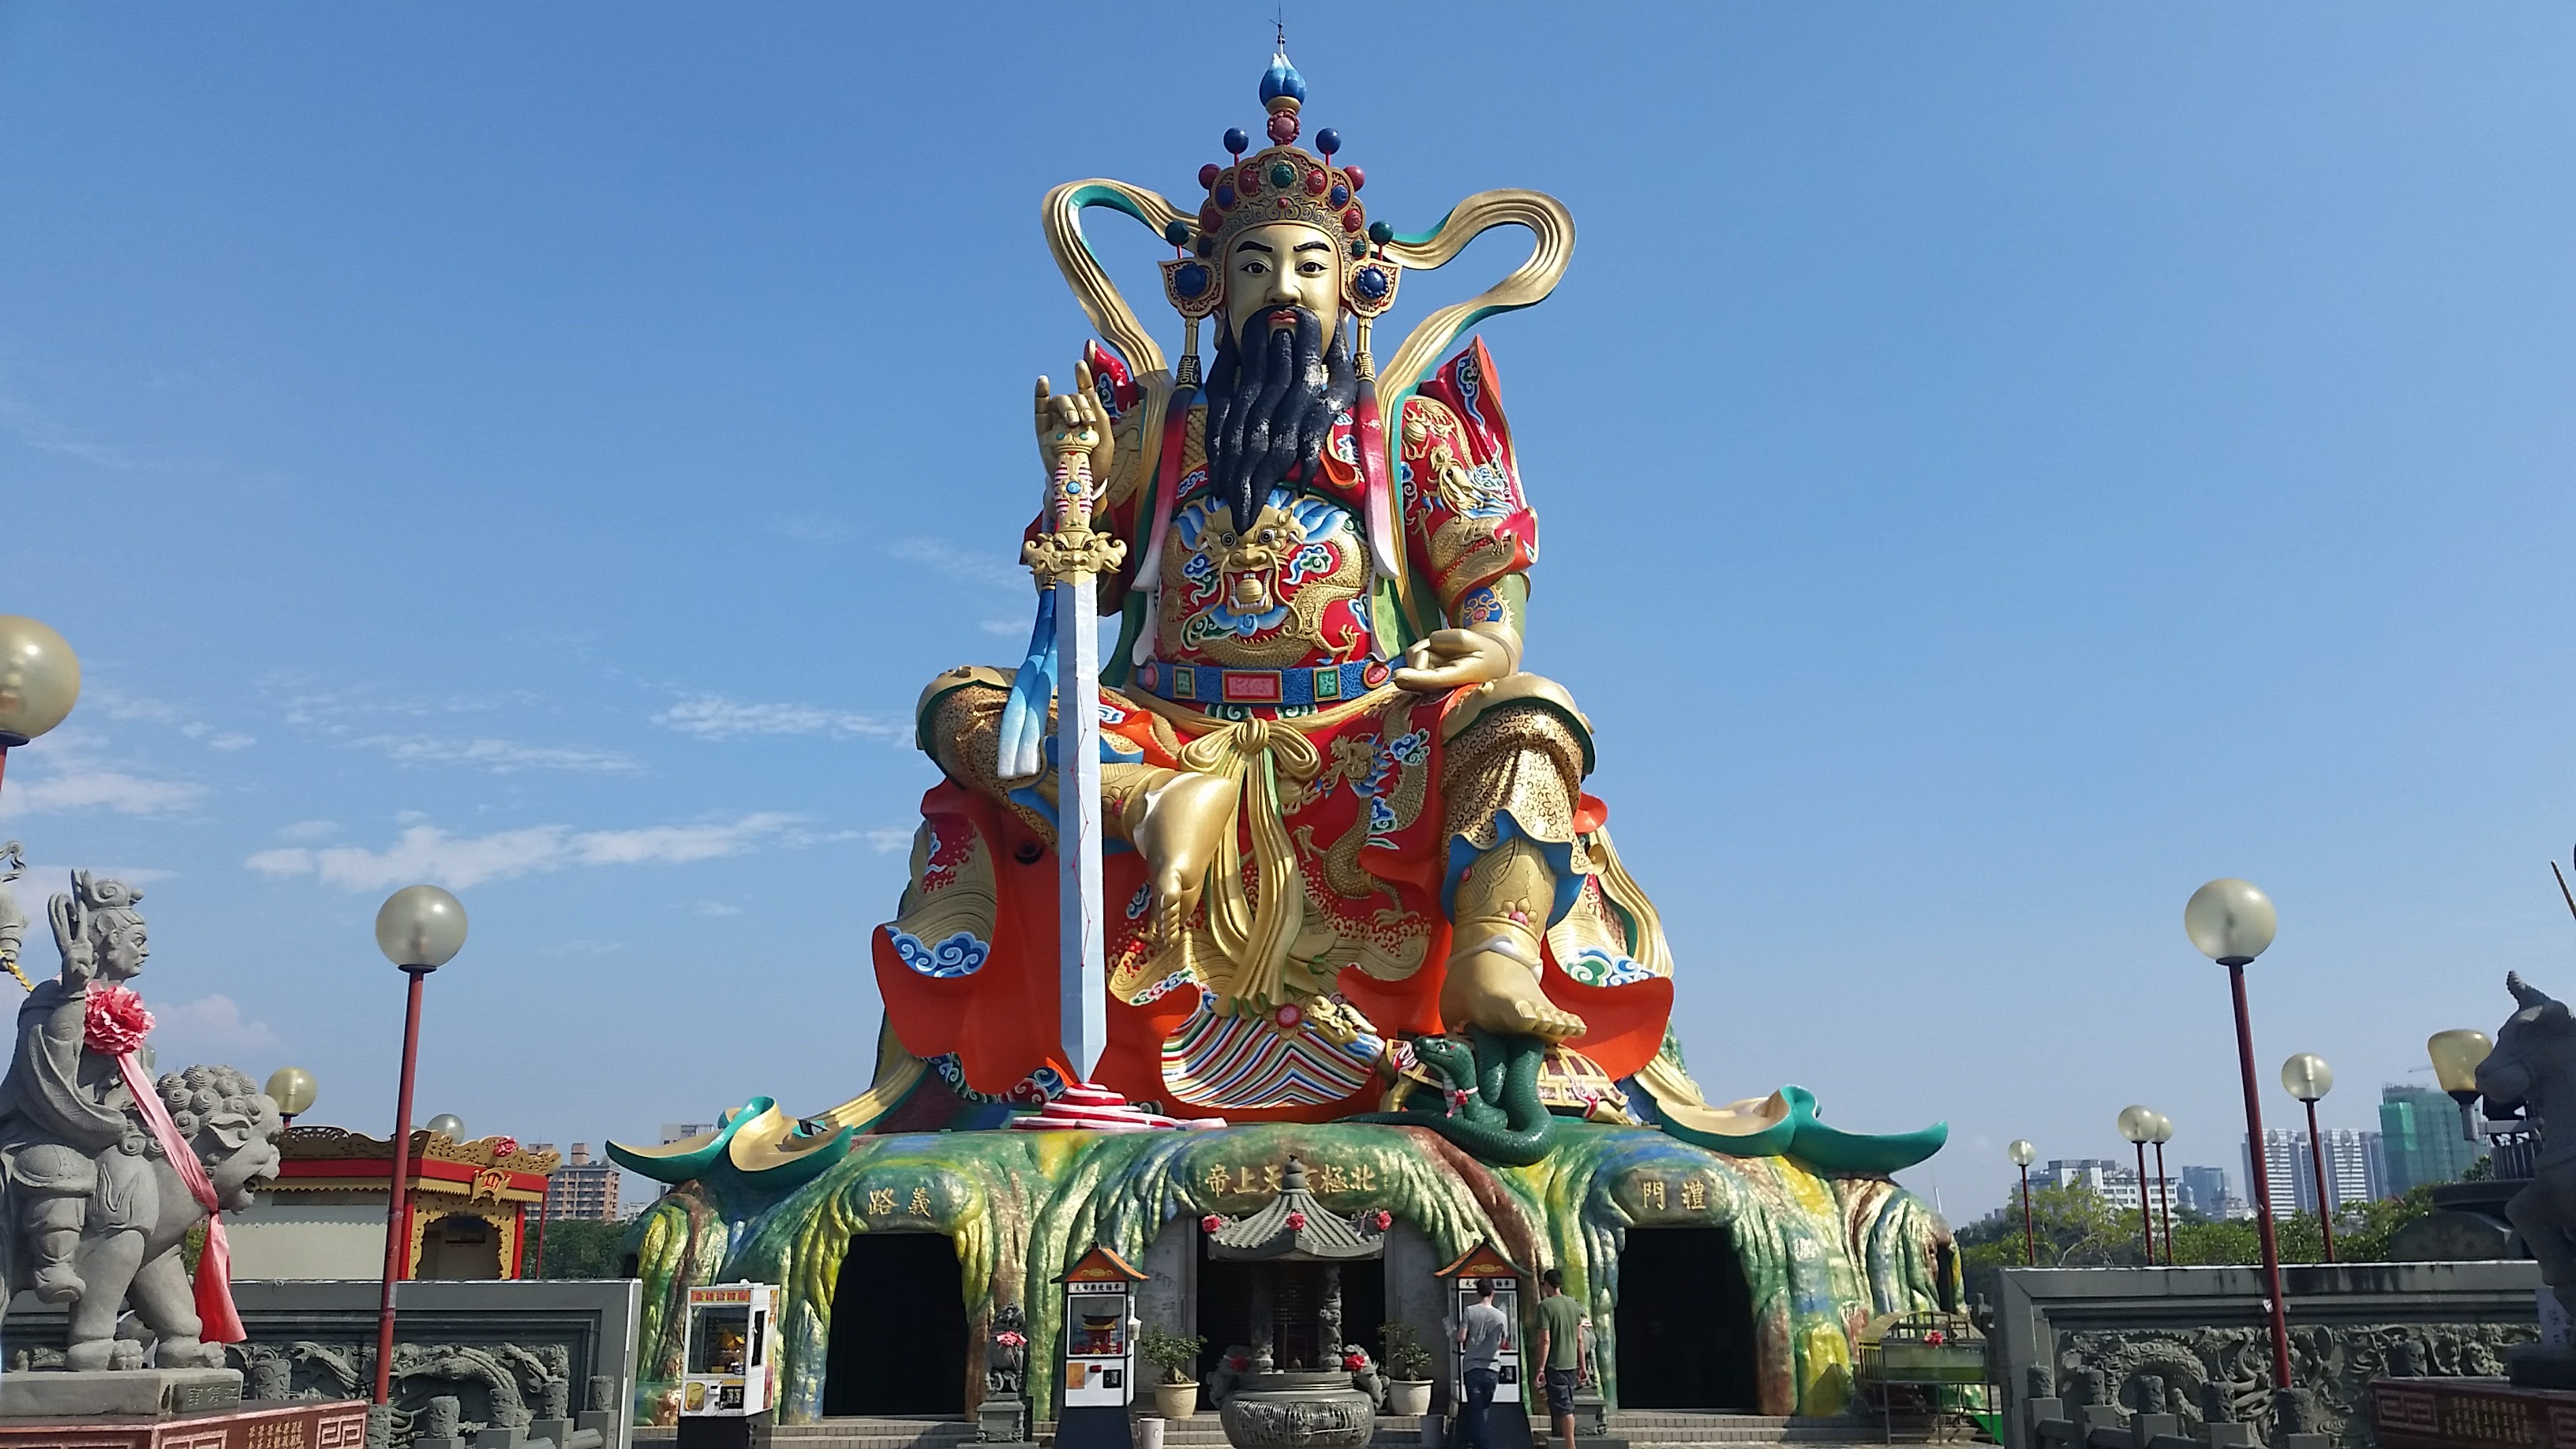 koahsiung-featured-image